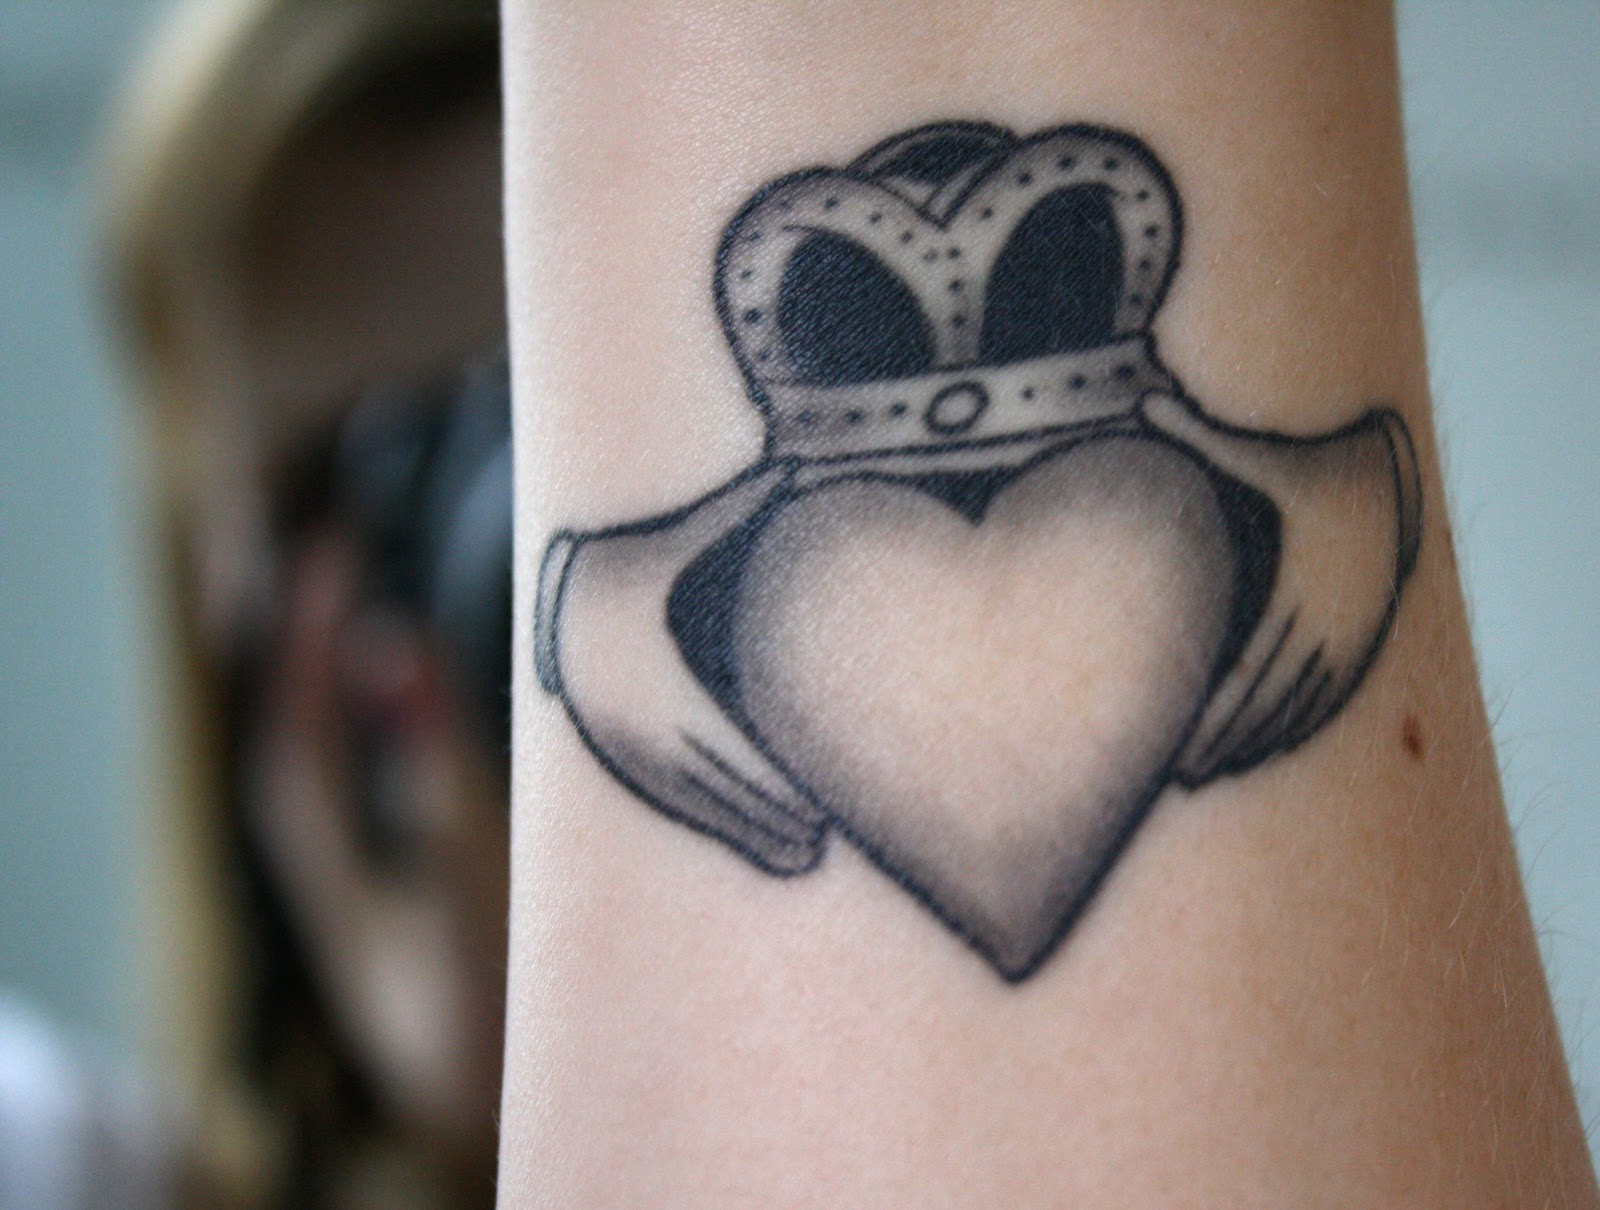 Claddagh tattoo on my inner right wrist.